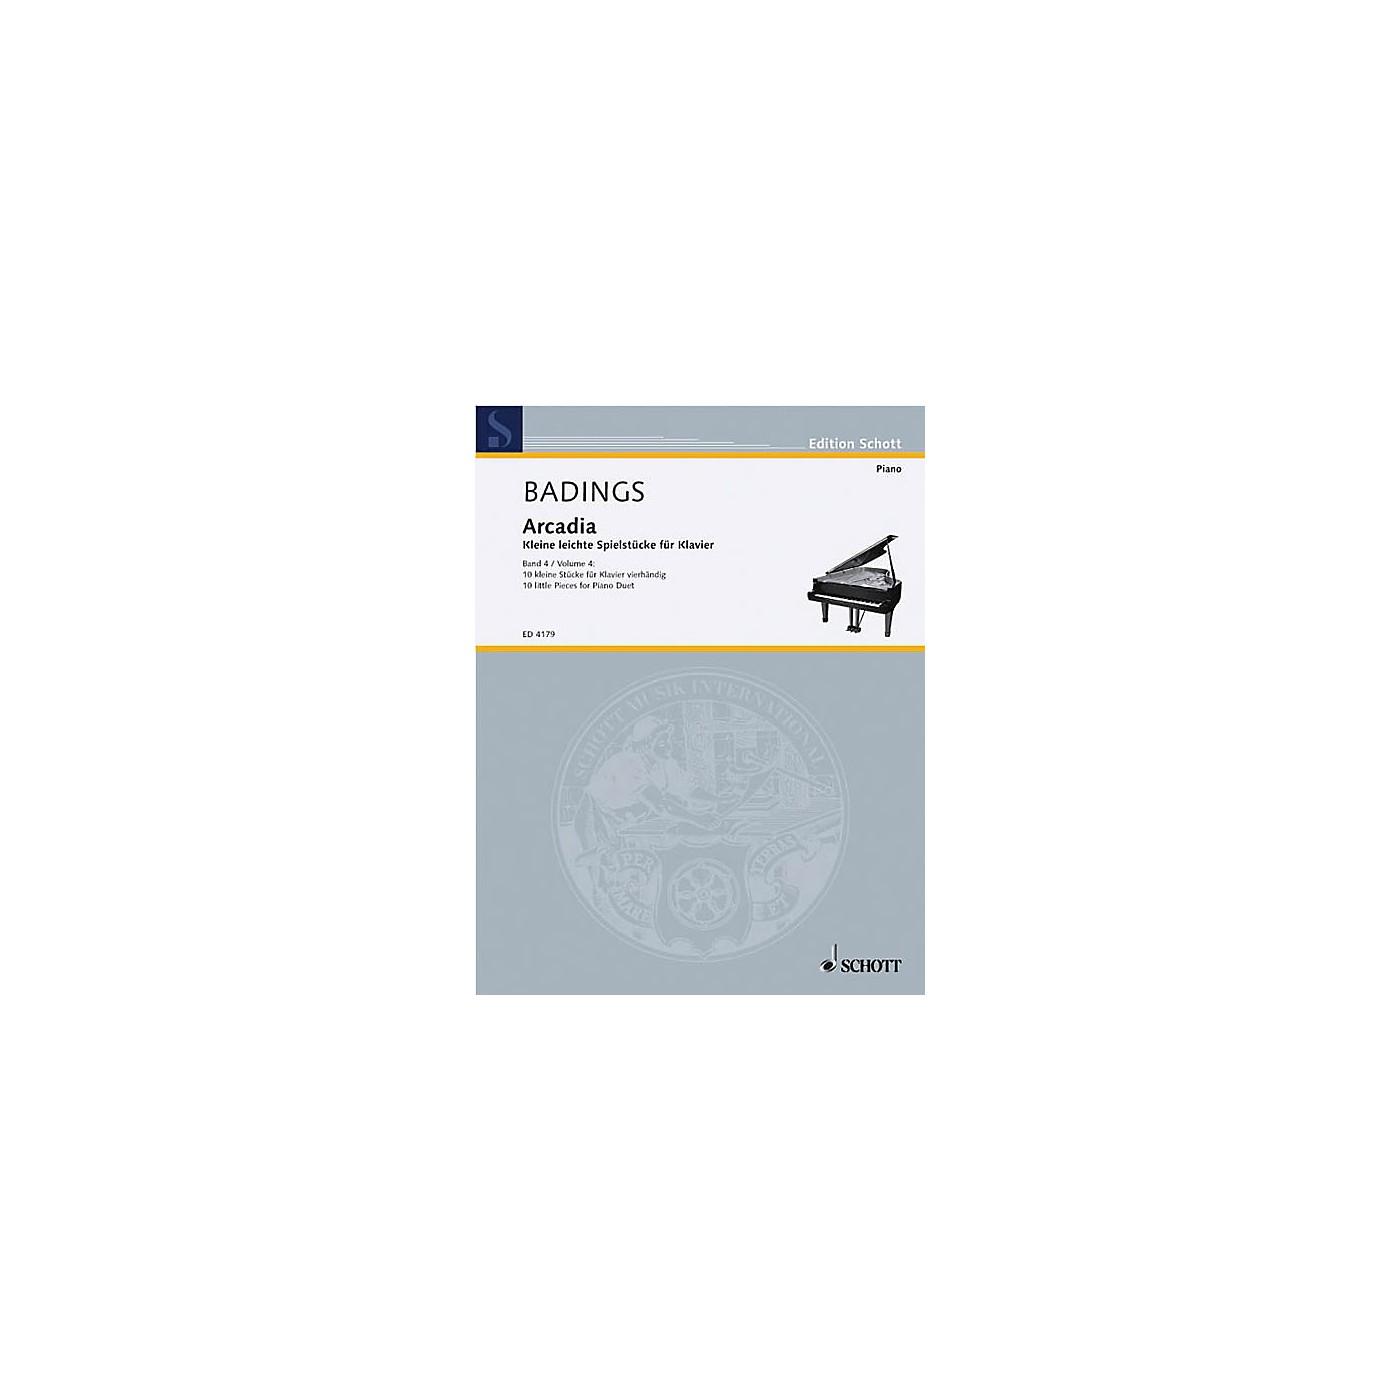 Schott Arcadia - Volume 4 (10 Little Pieces for Piano) Schott Series thumbnail